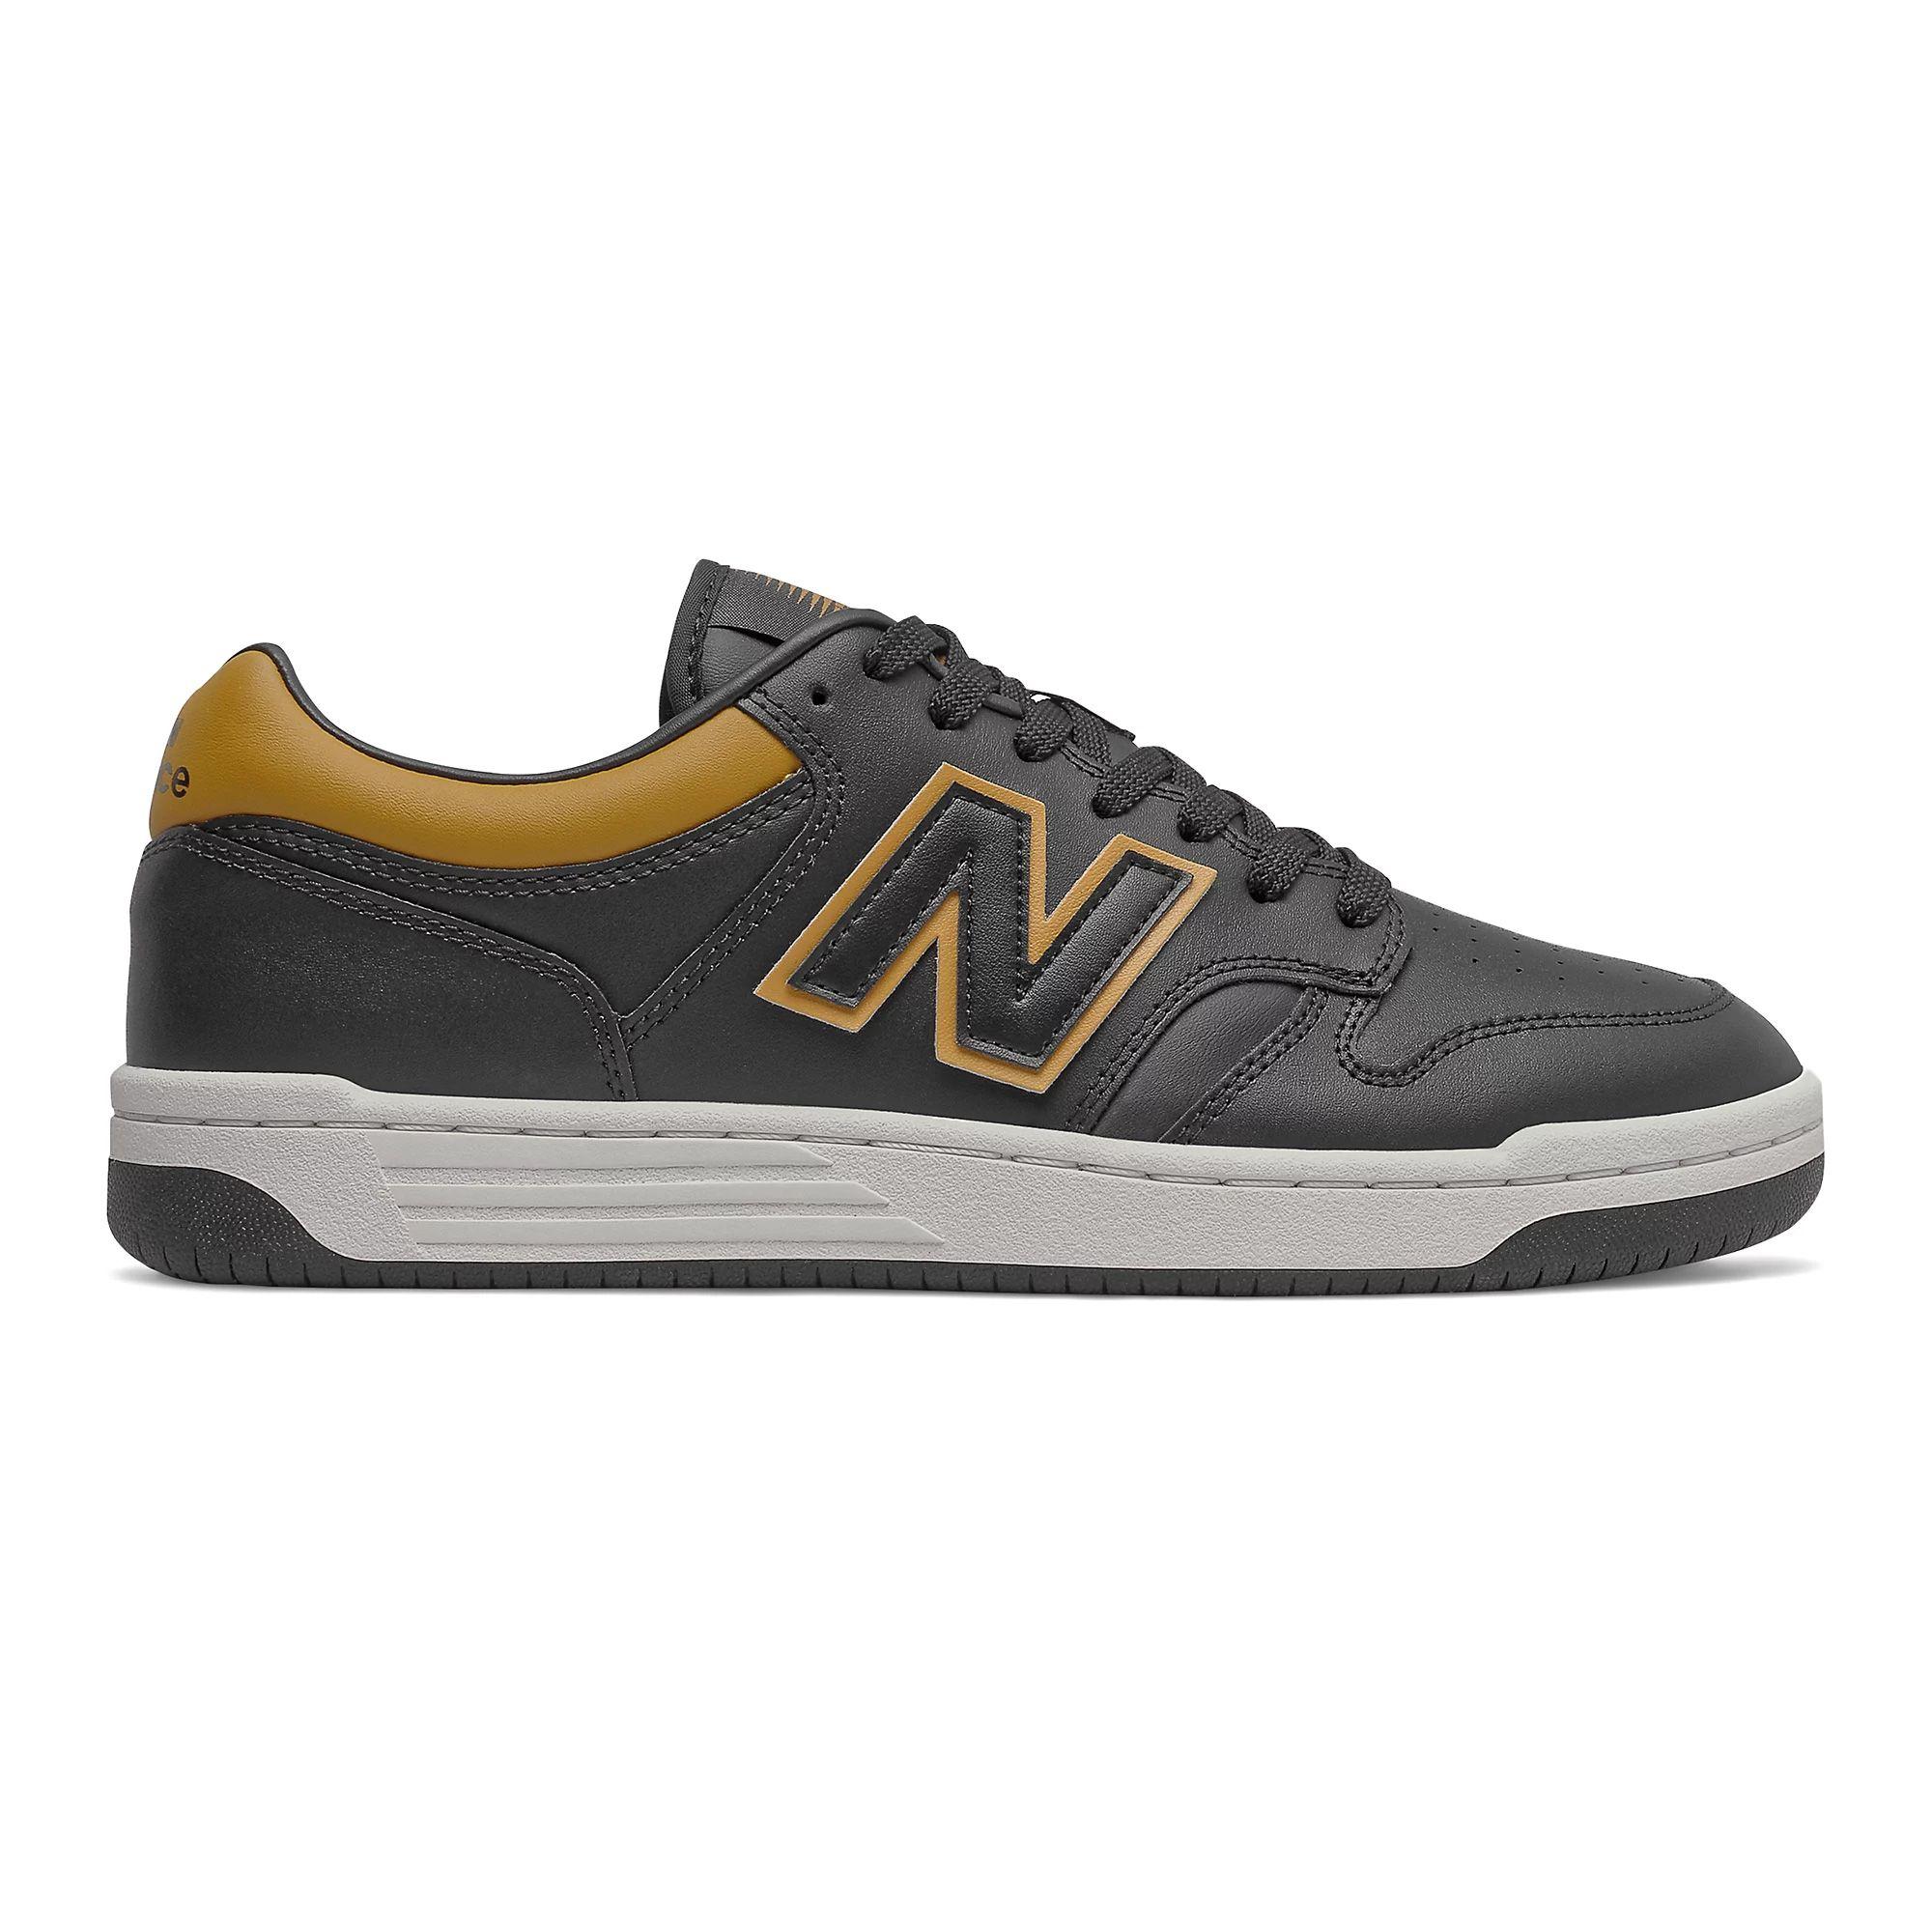 New Balance Men's BB480 in Black/Workwear/Gold/White